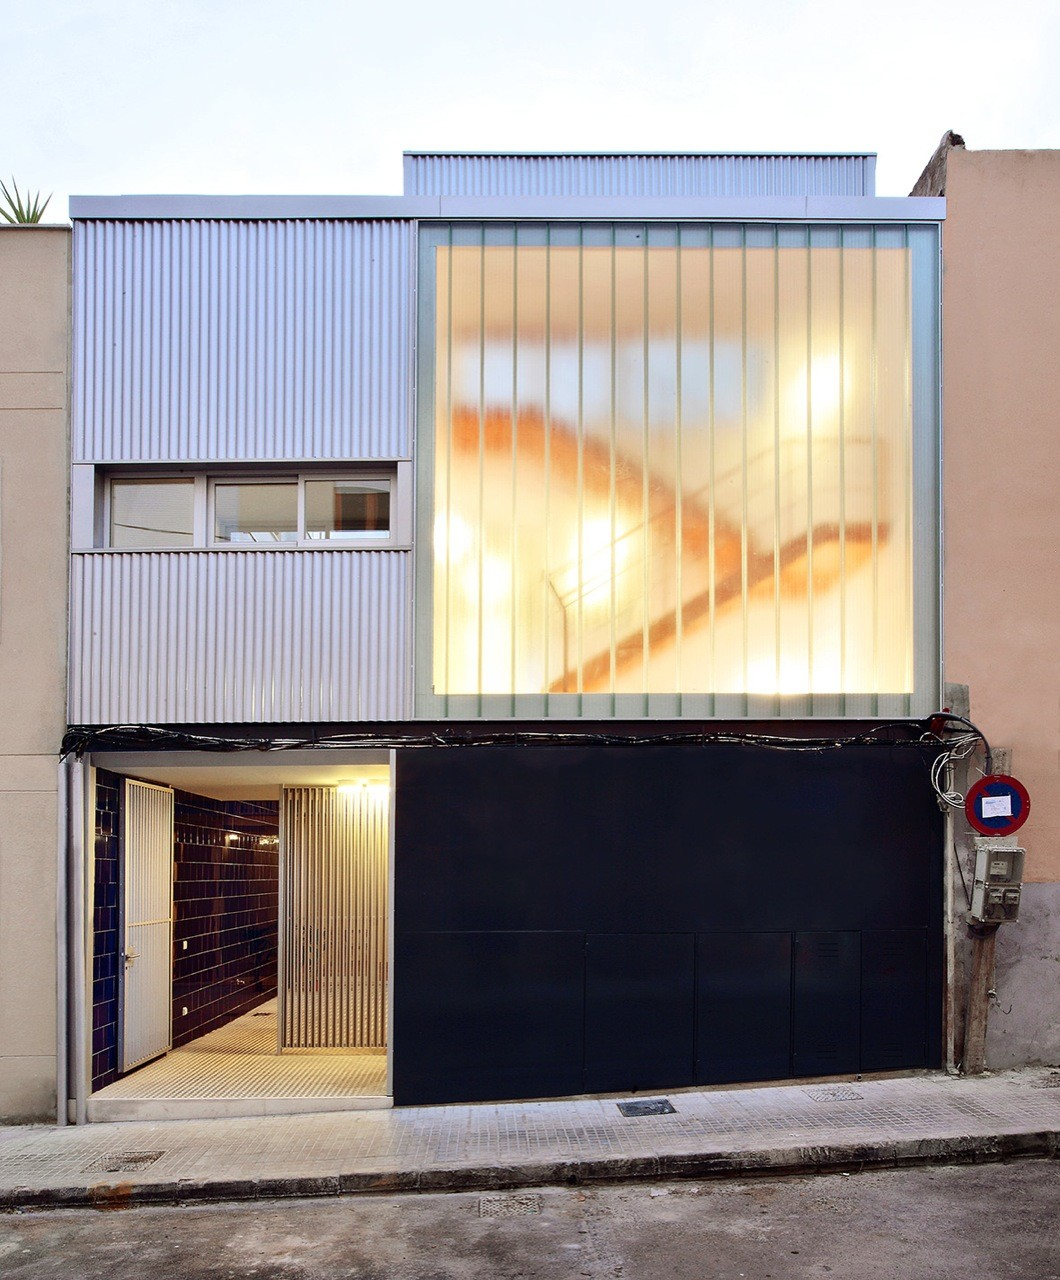 Arquitectura: Two Apartments / FLEXO Arquitectura